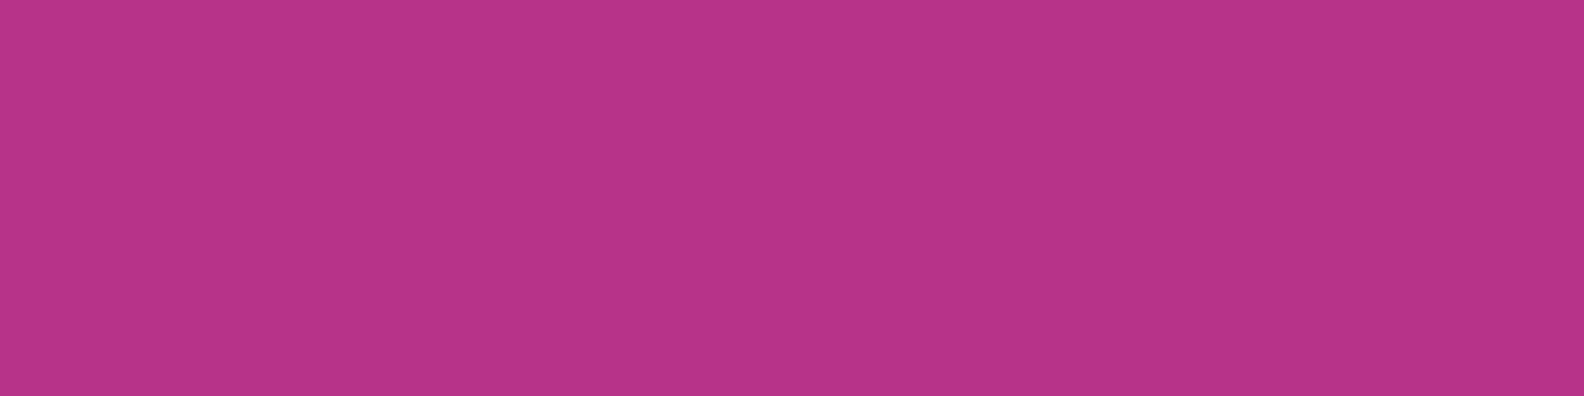 1584x396 Fandango Solid Color Background